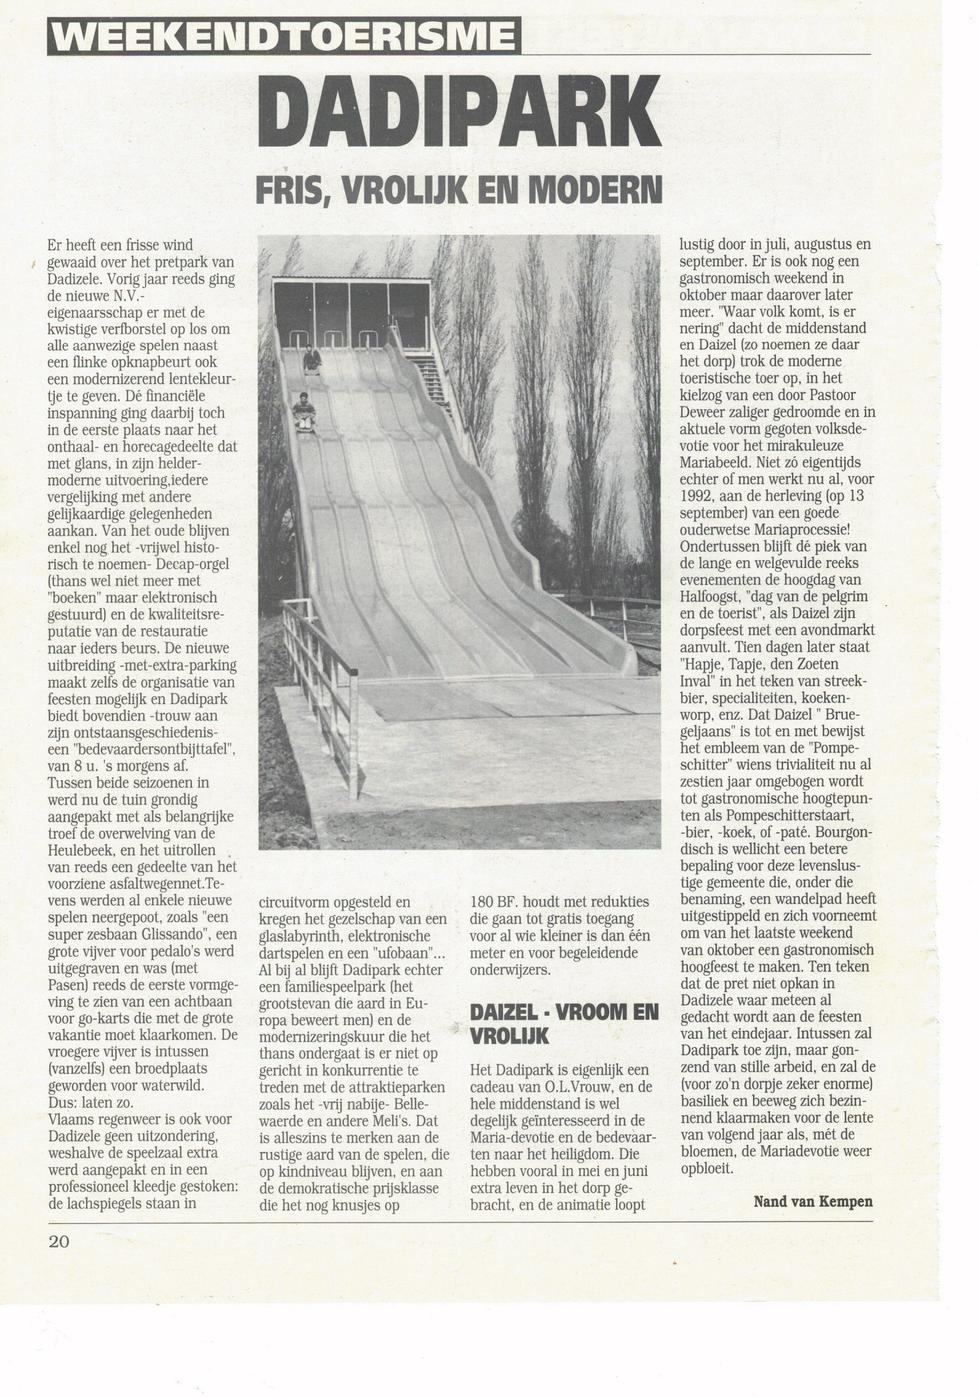 Dadipark krantenartikels_Pagina_07.png